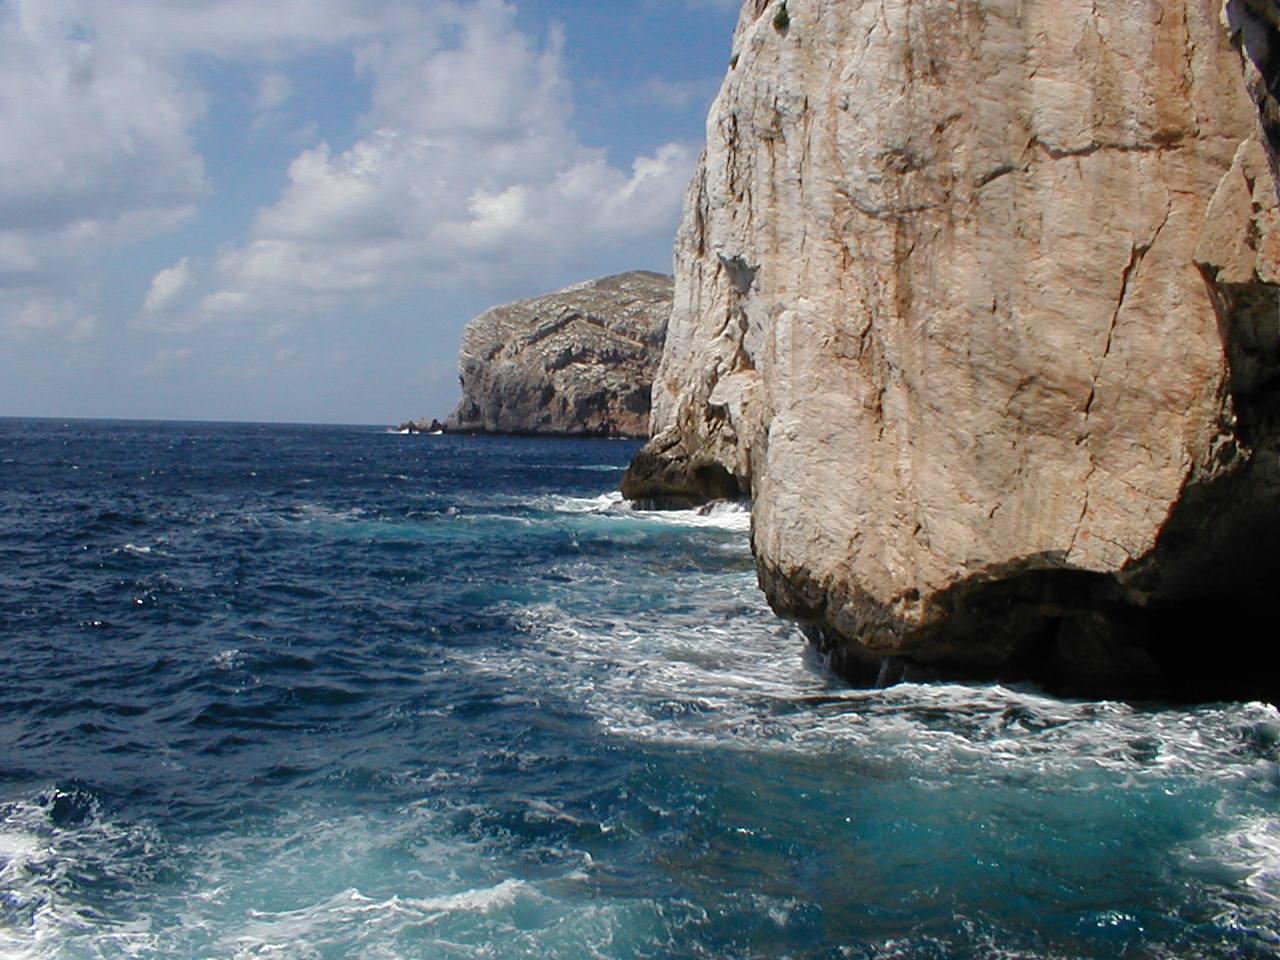 http://www.viaggiavventurenelmondo.it/immagini/sardegna0.jpg